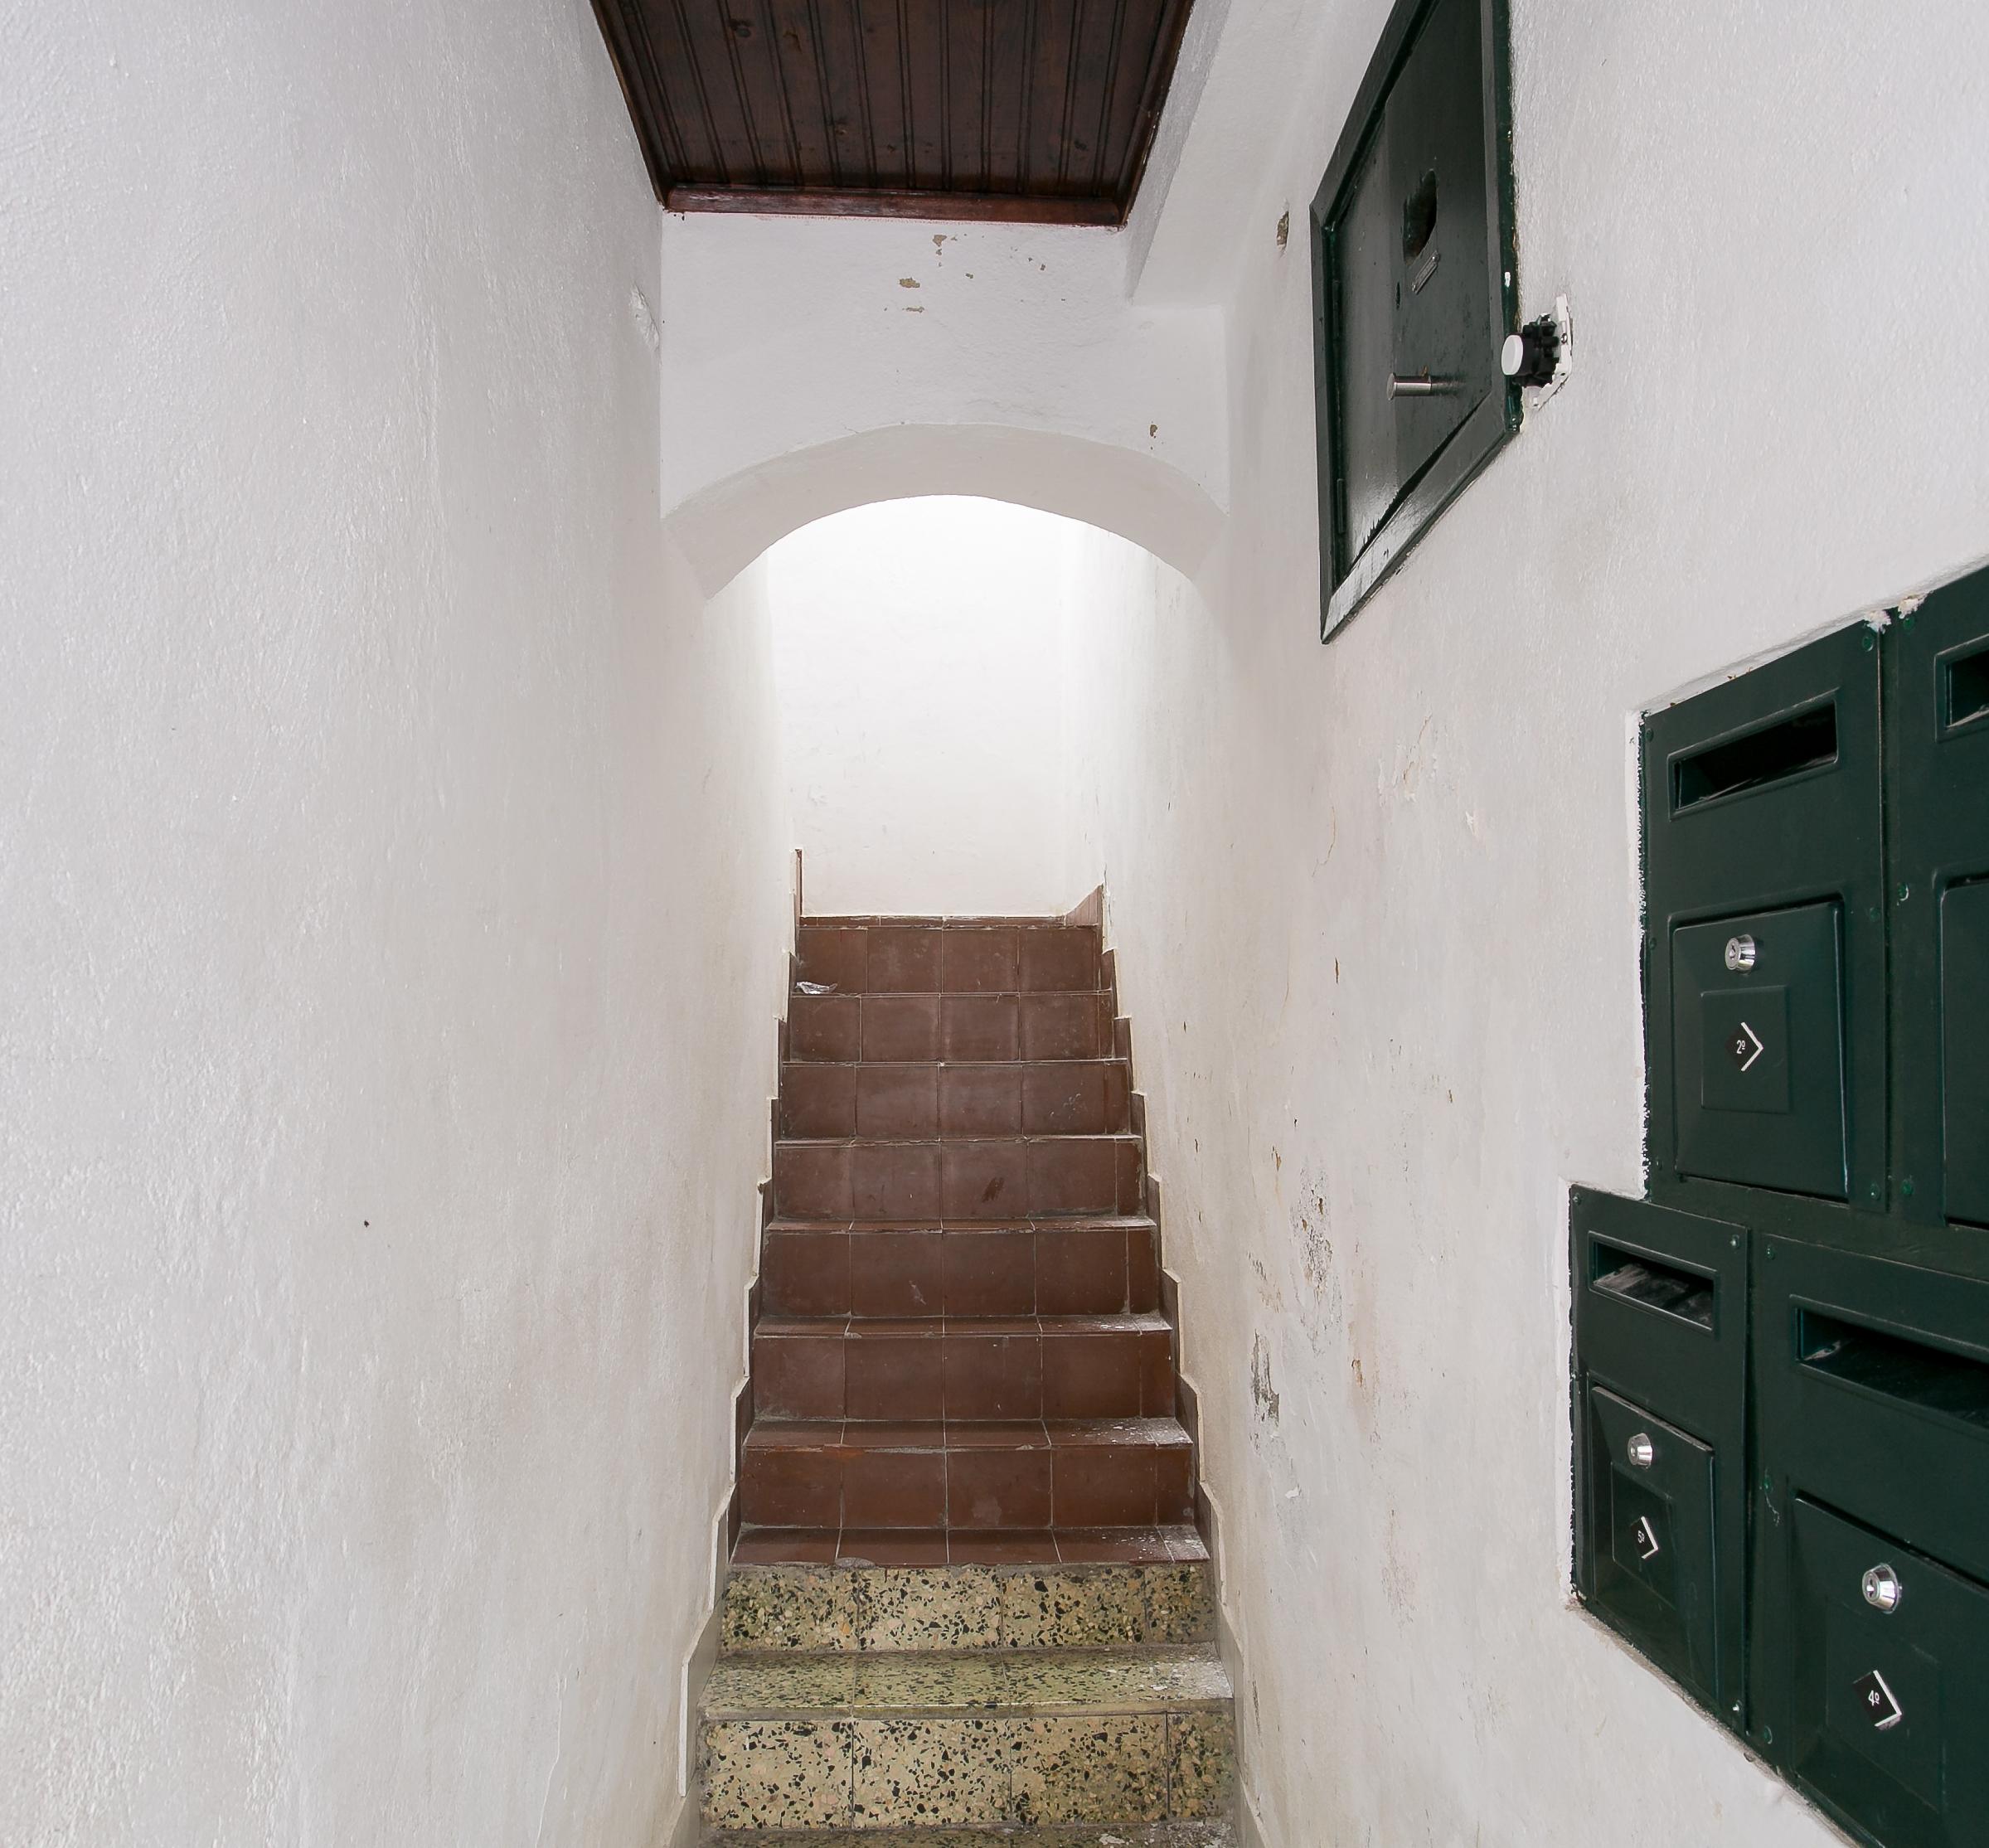 Rua da silva hallway building